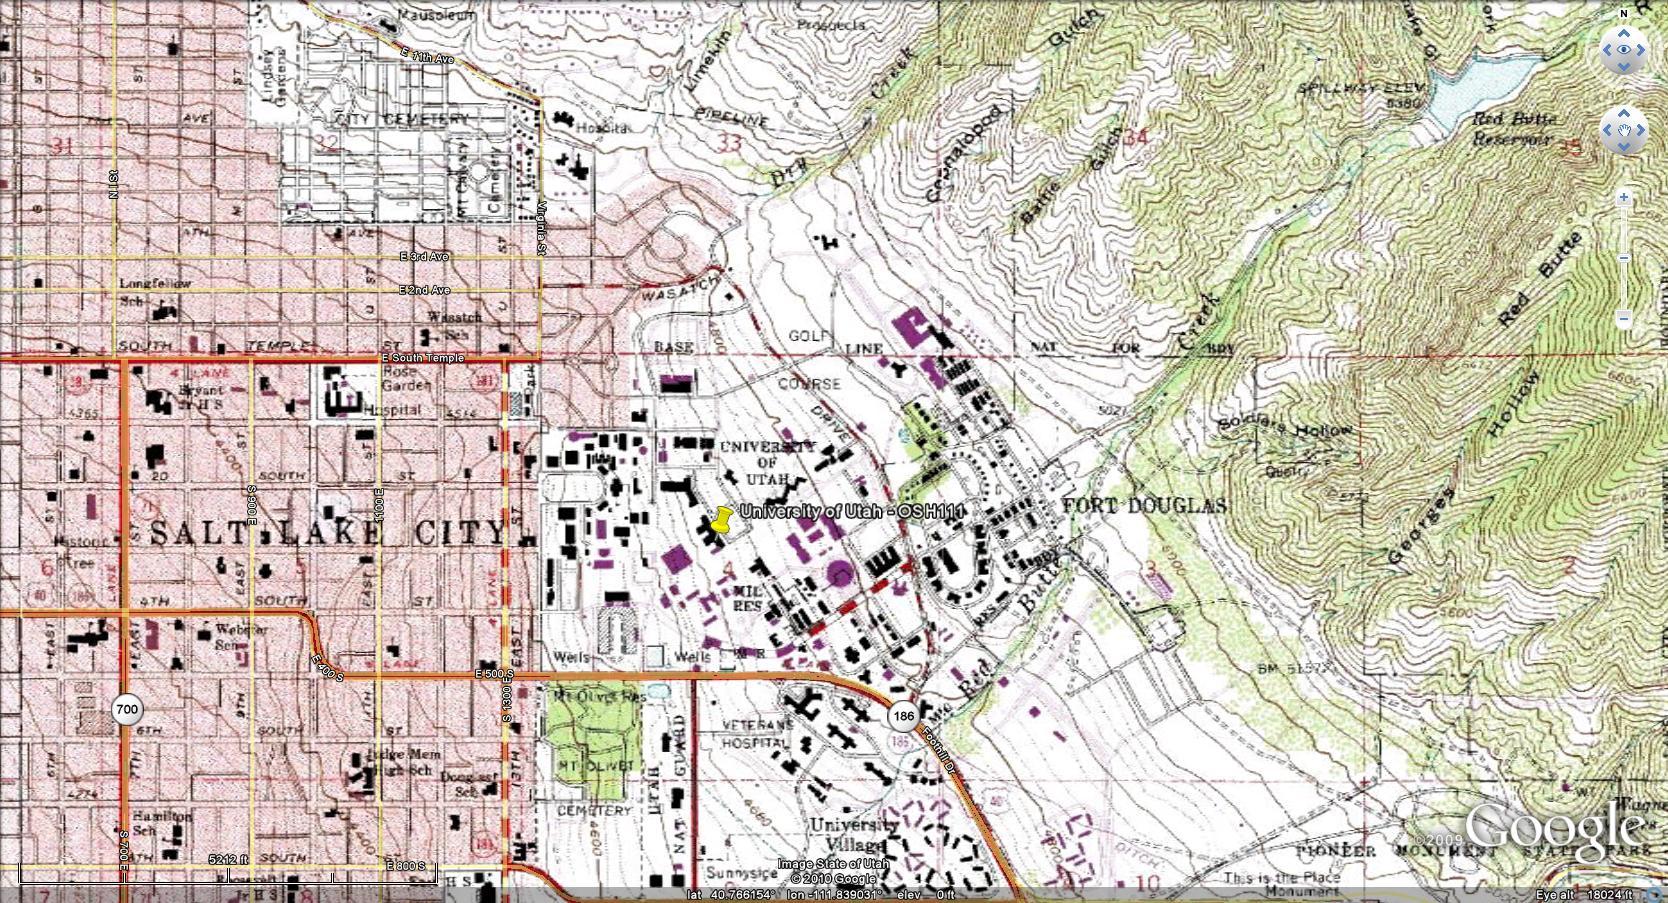 WebText GEOGRAPHY OF UTAH - Topographic map of utah